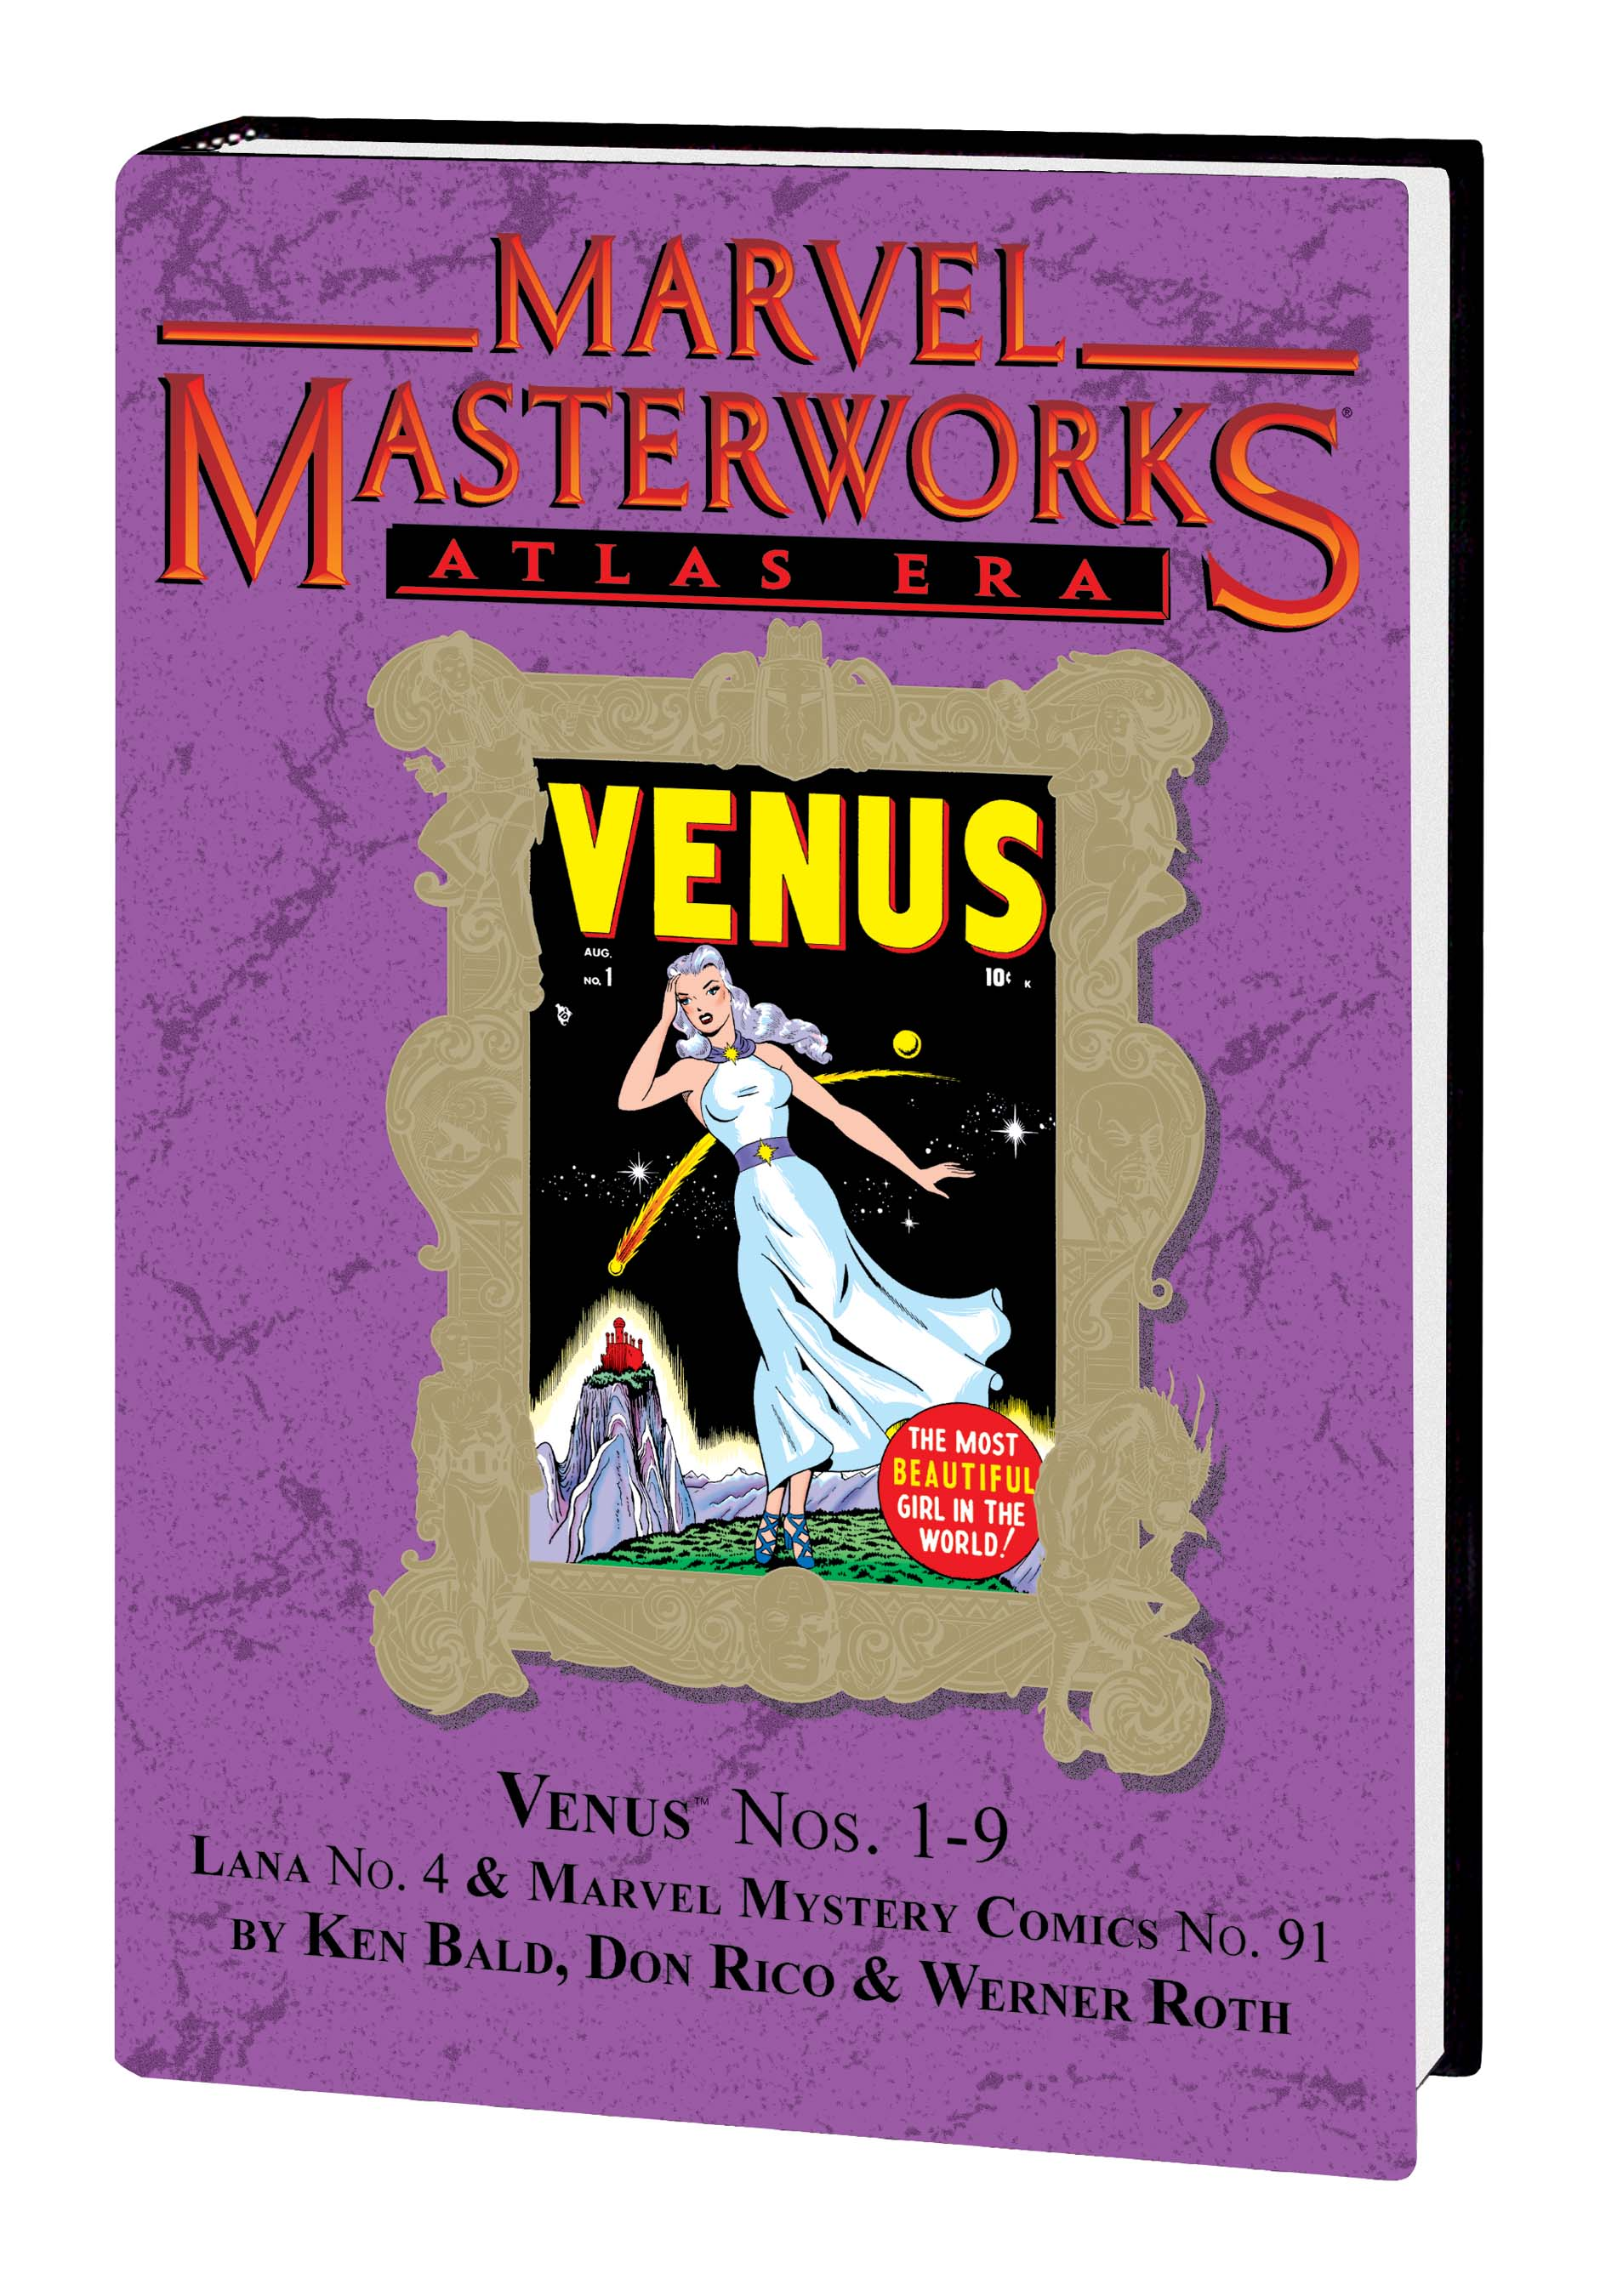 Marvel Masterworks: Atlas Era Venus (Hardcover)